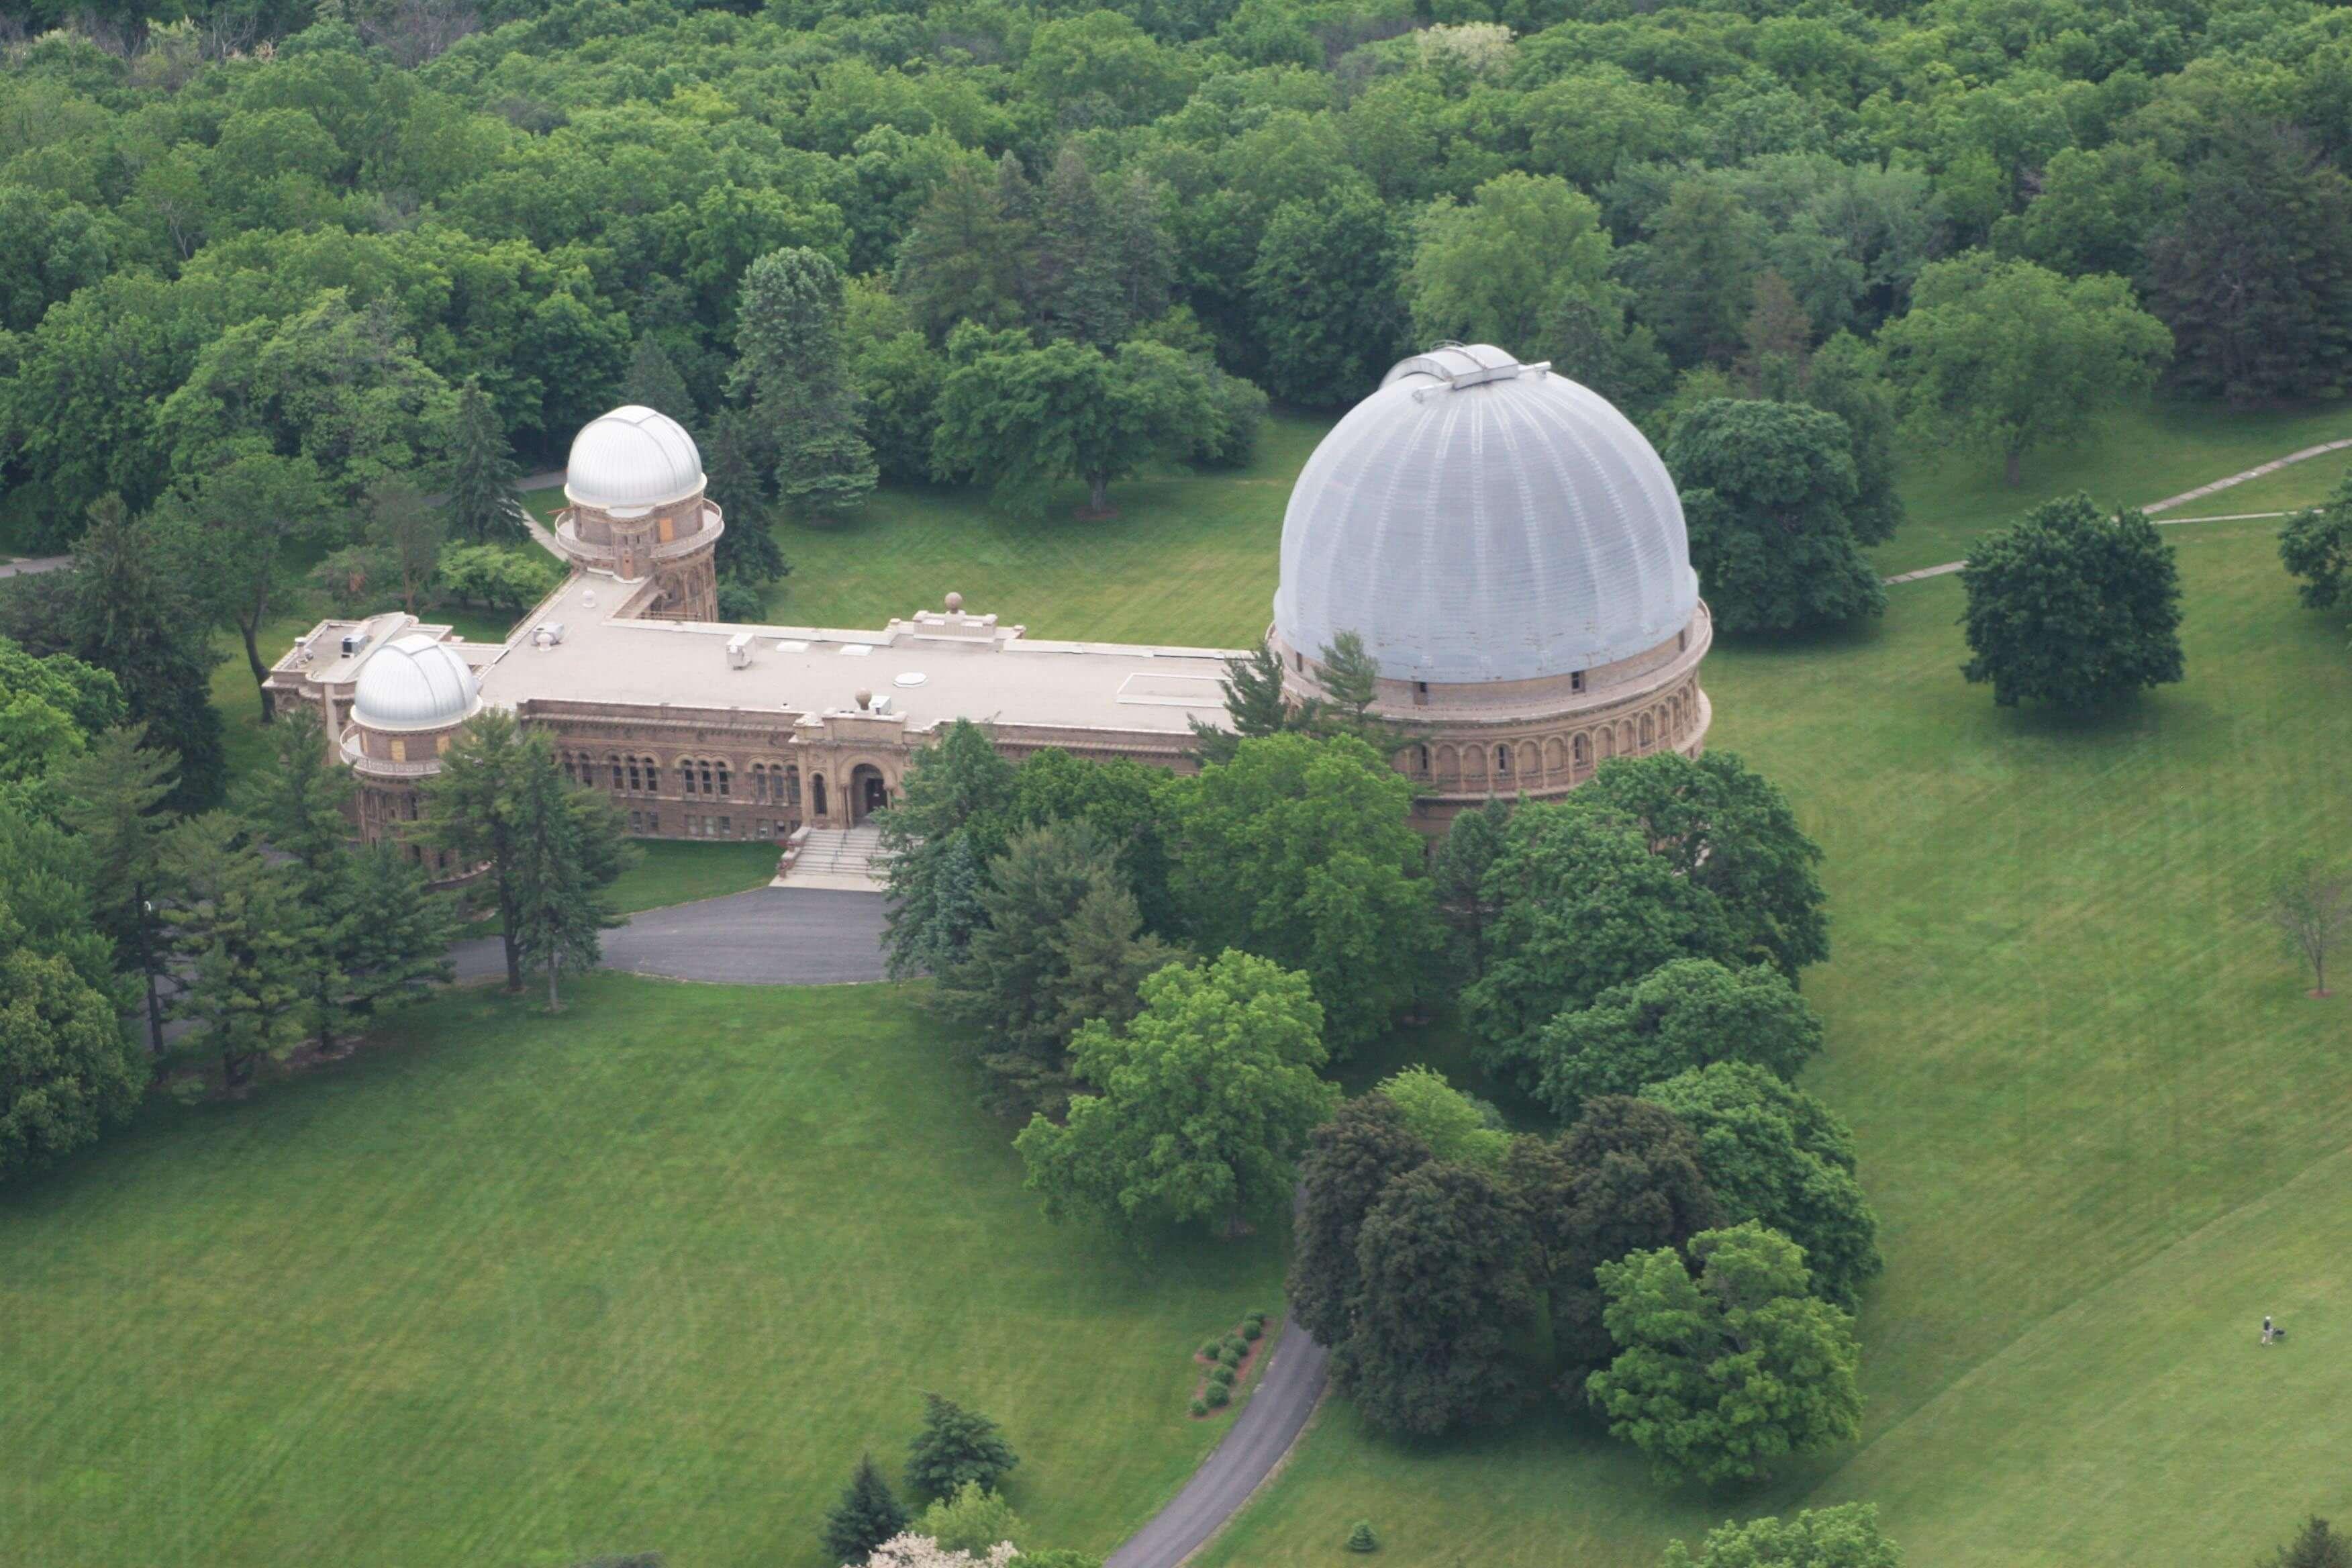 Restoration Yerkes Observatory, Williams Bay WI